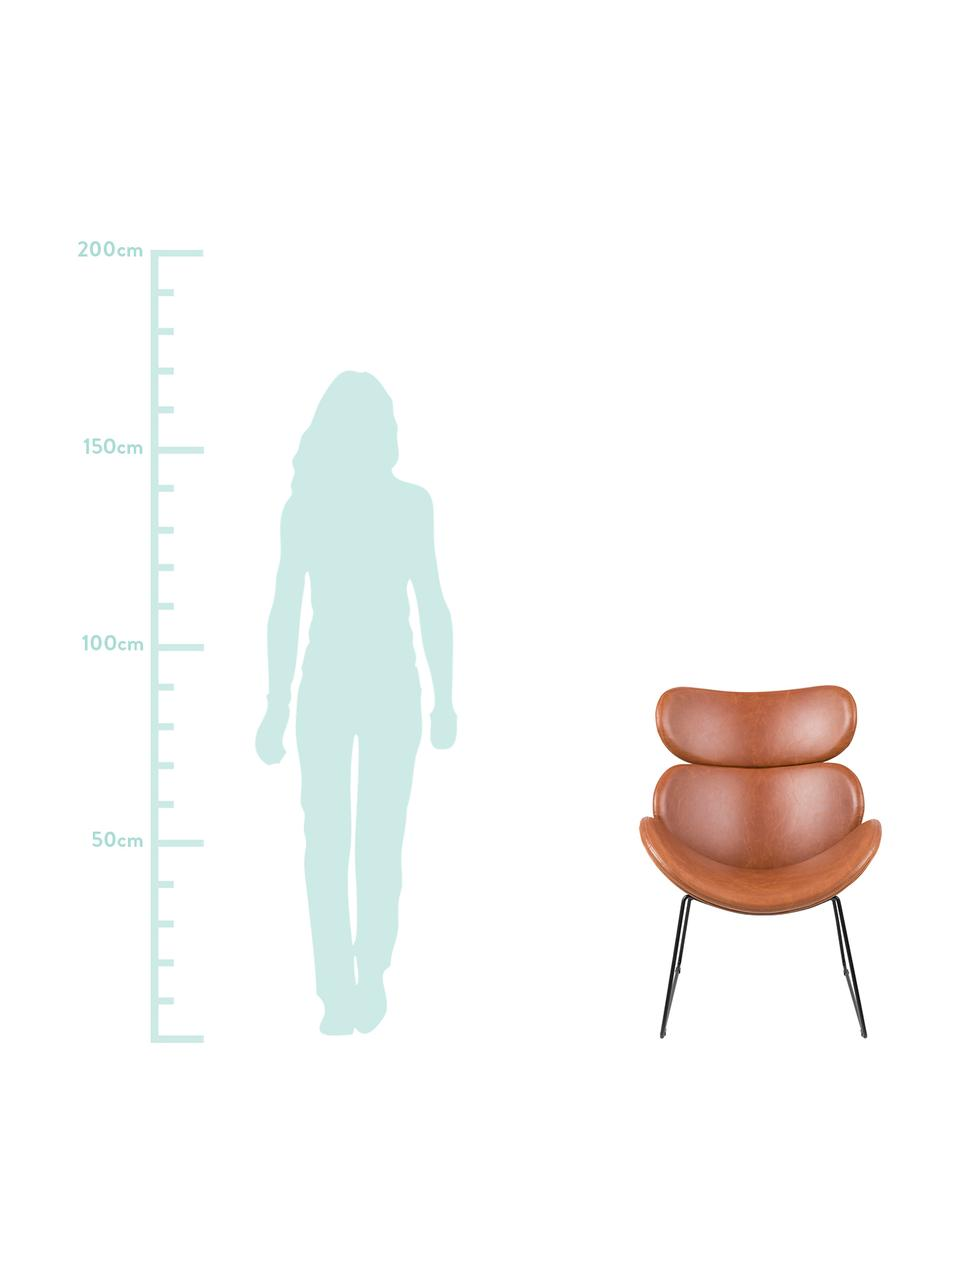 Sedia a poltrona moderna in similpelle Cazar, Rivestimento: similpelle (poliuretano), Struttura: metallo verniciato a polv, Cognac, nero, Larg. 69 x Prof. 79 cm